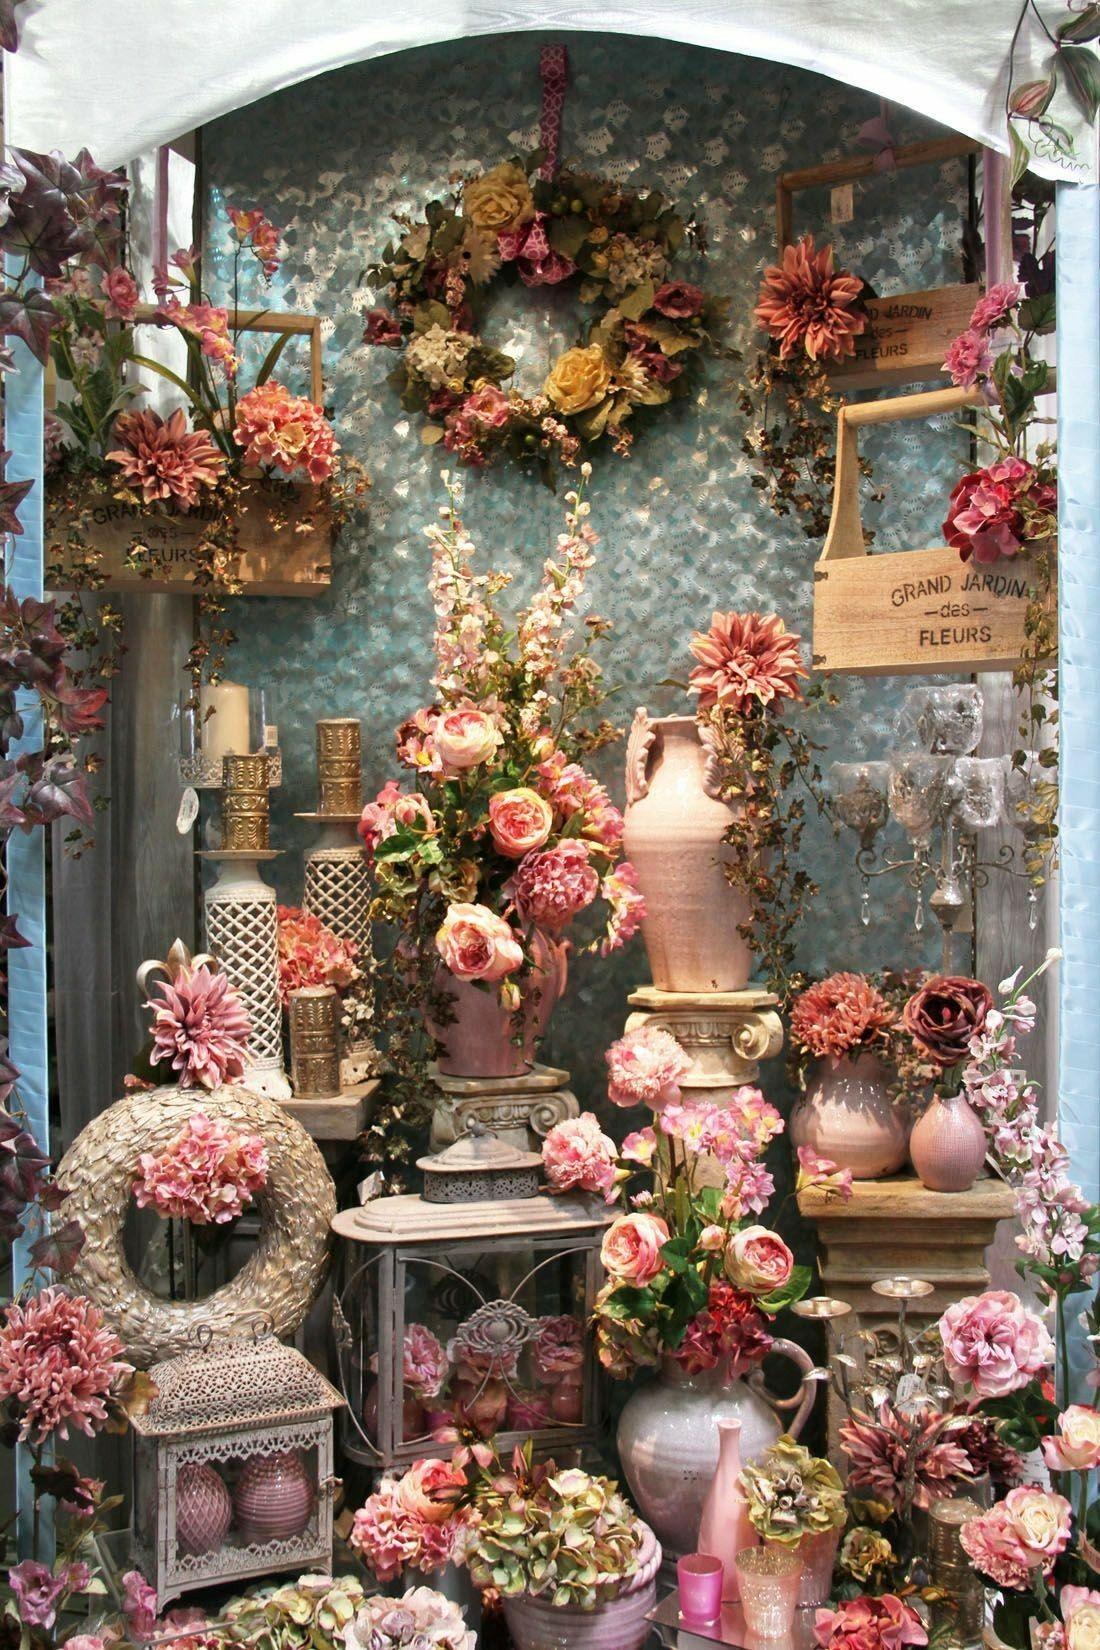 Flower shop display image by Nancy Elston on floral shop